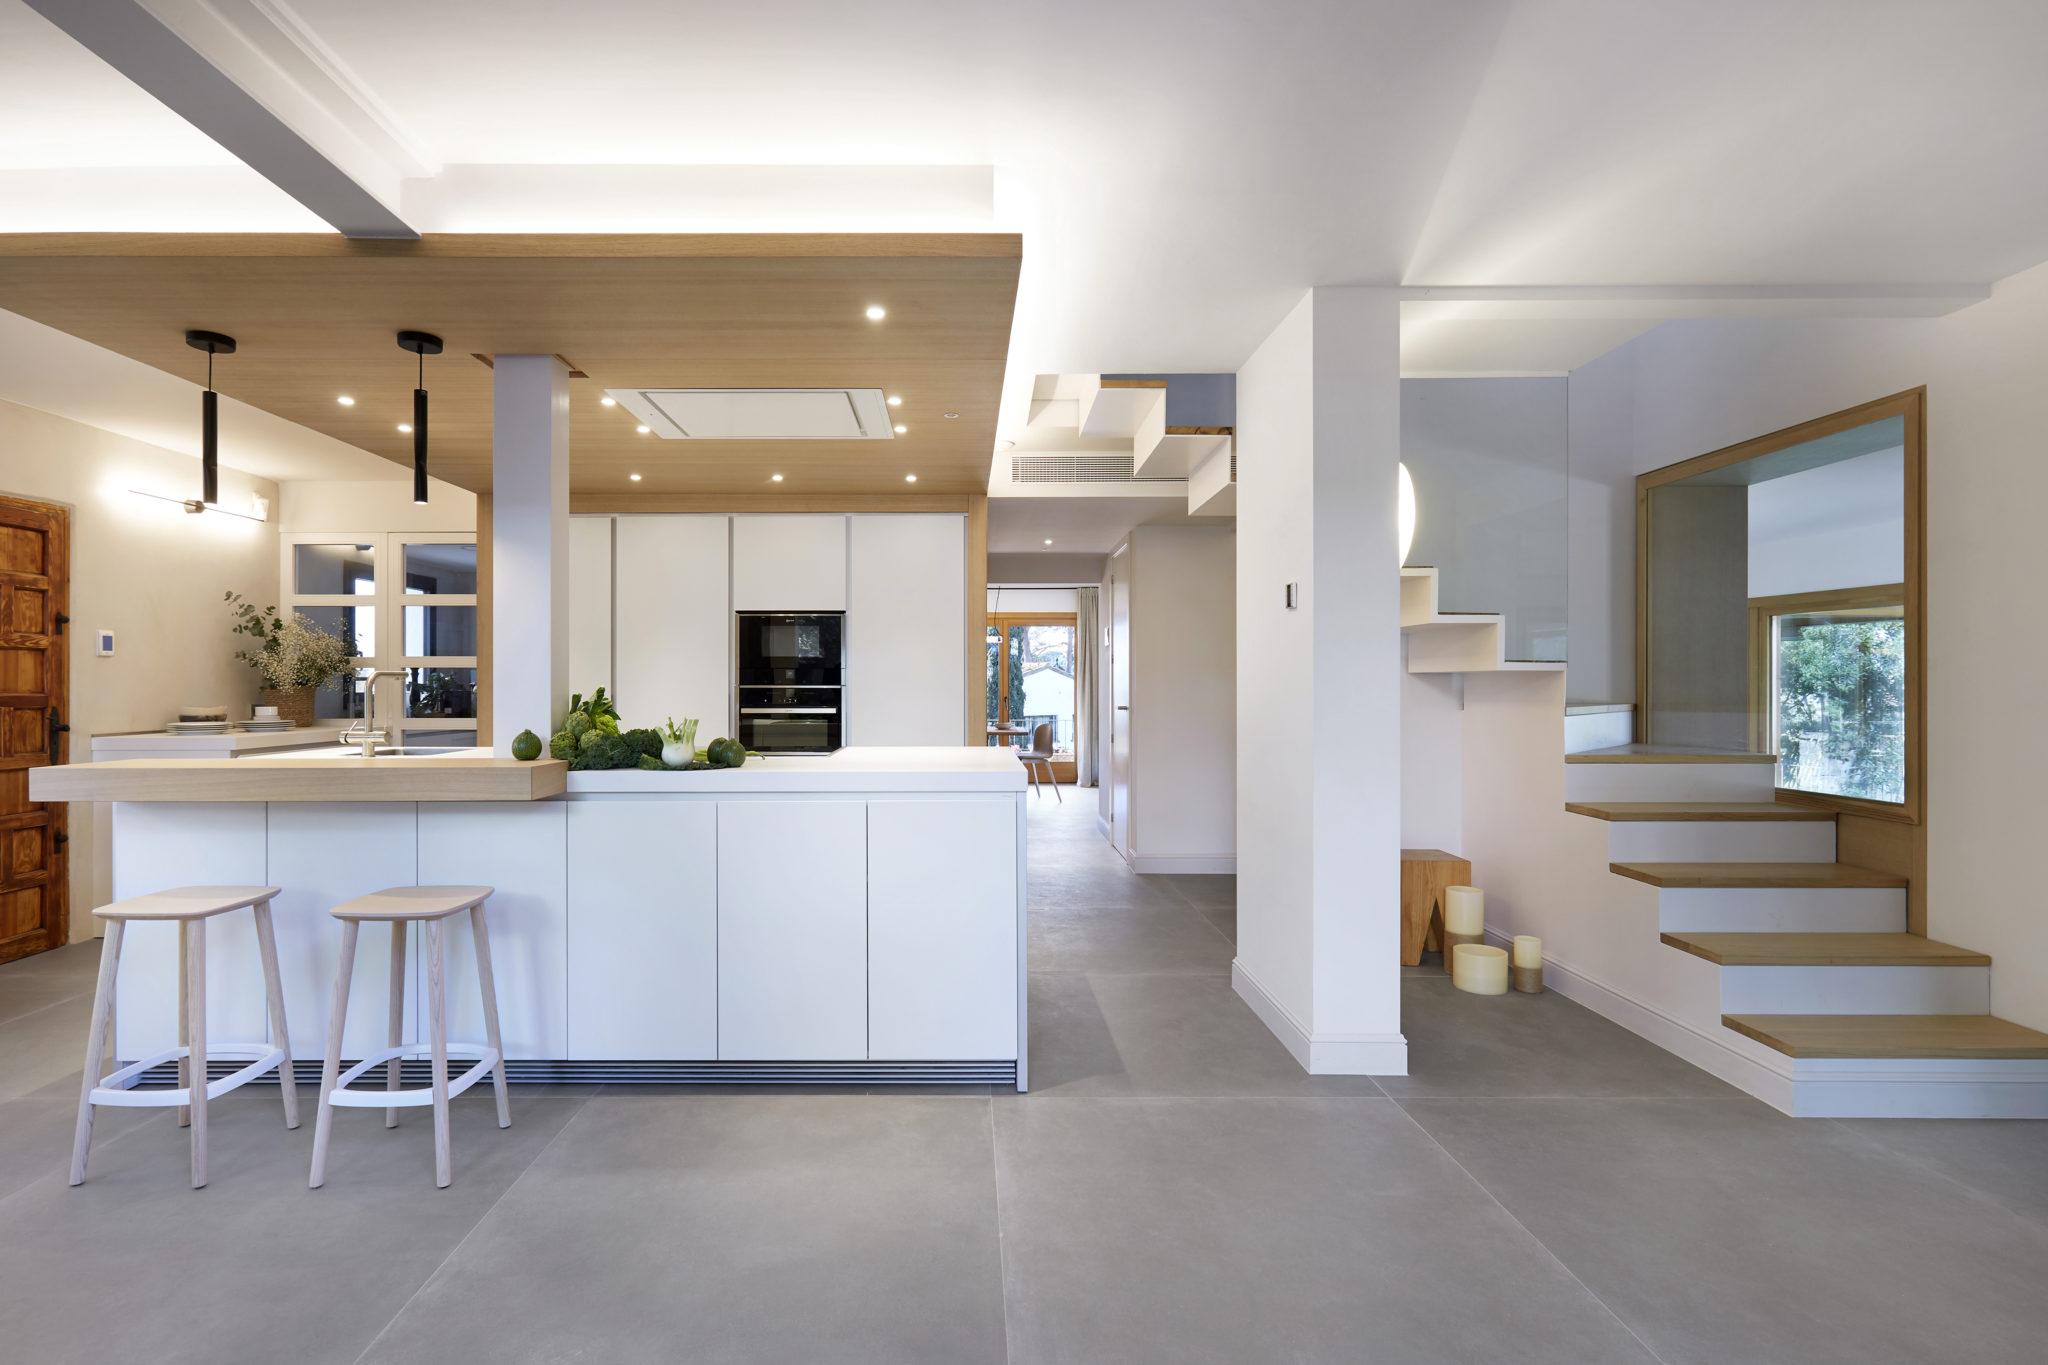 Cocina Bulthaup casa en llafranc por Rosa Colet Interior Design